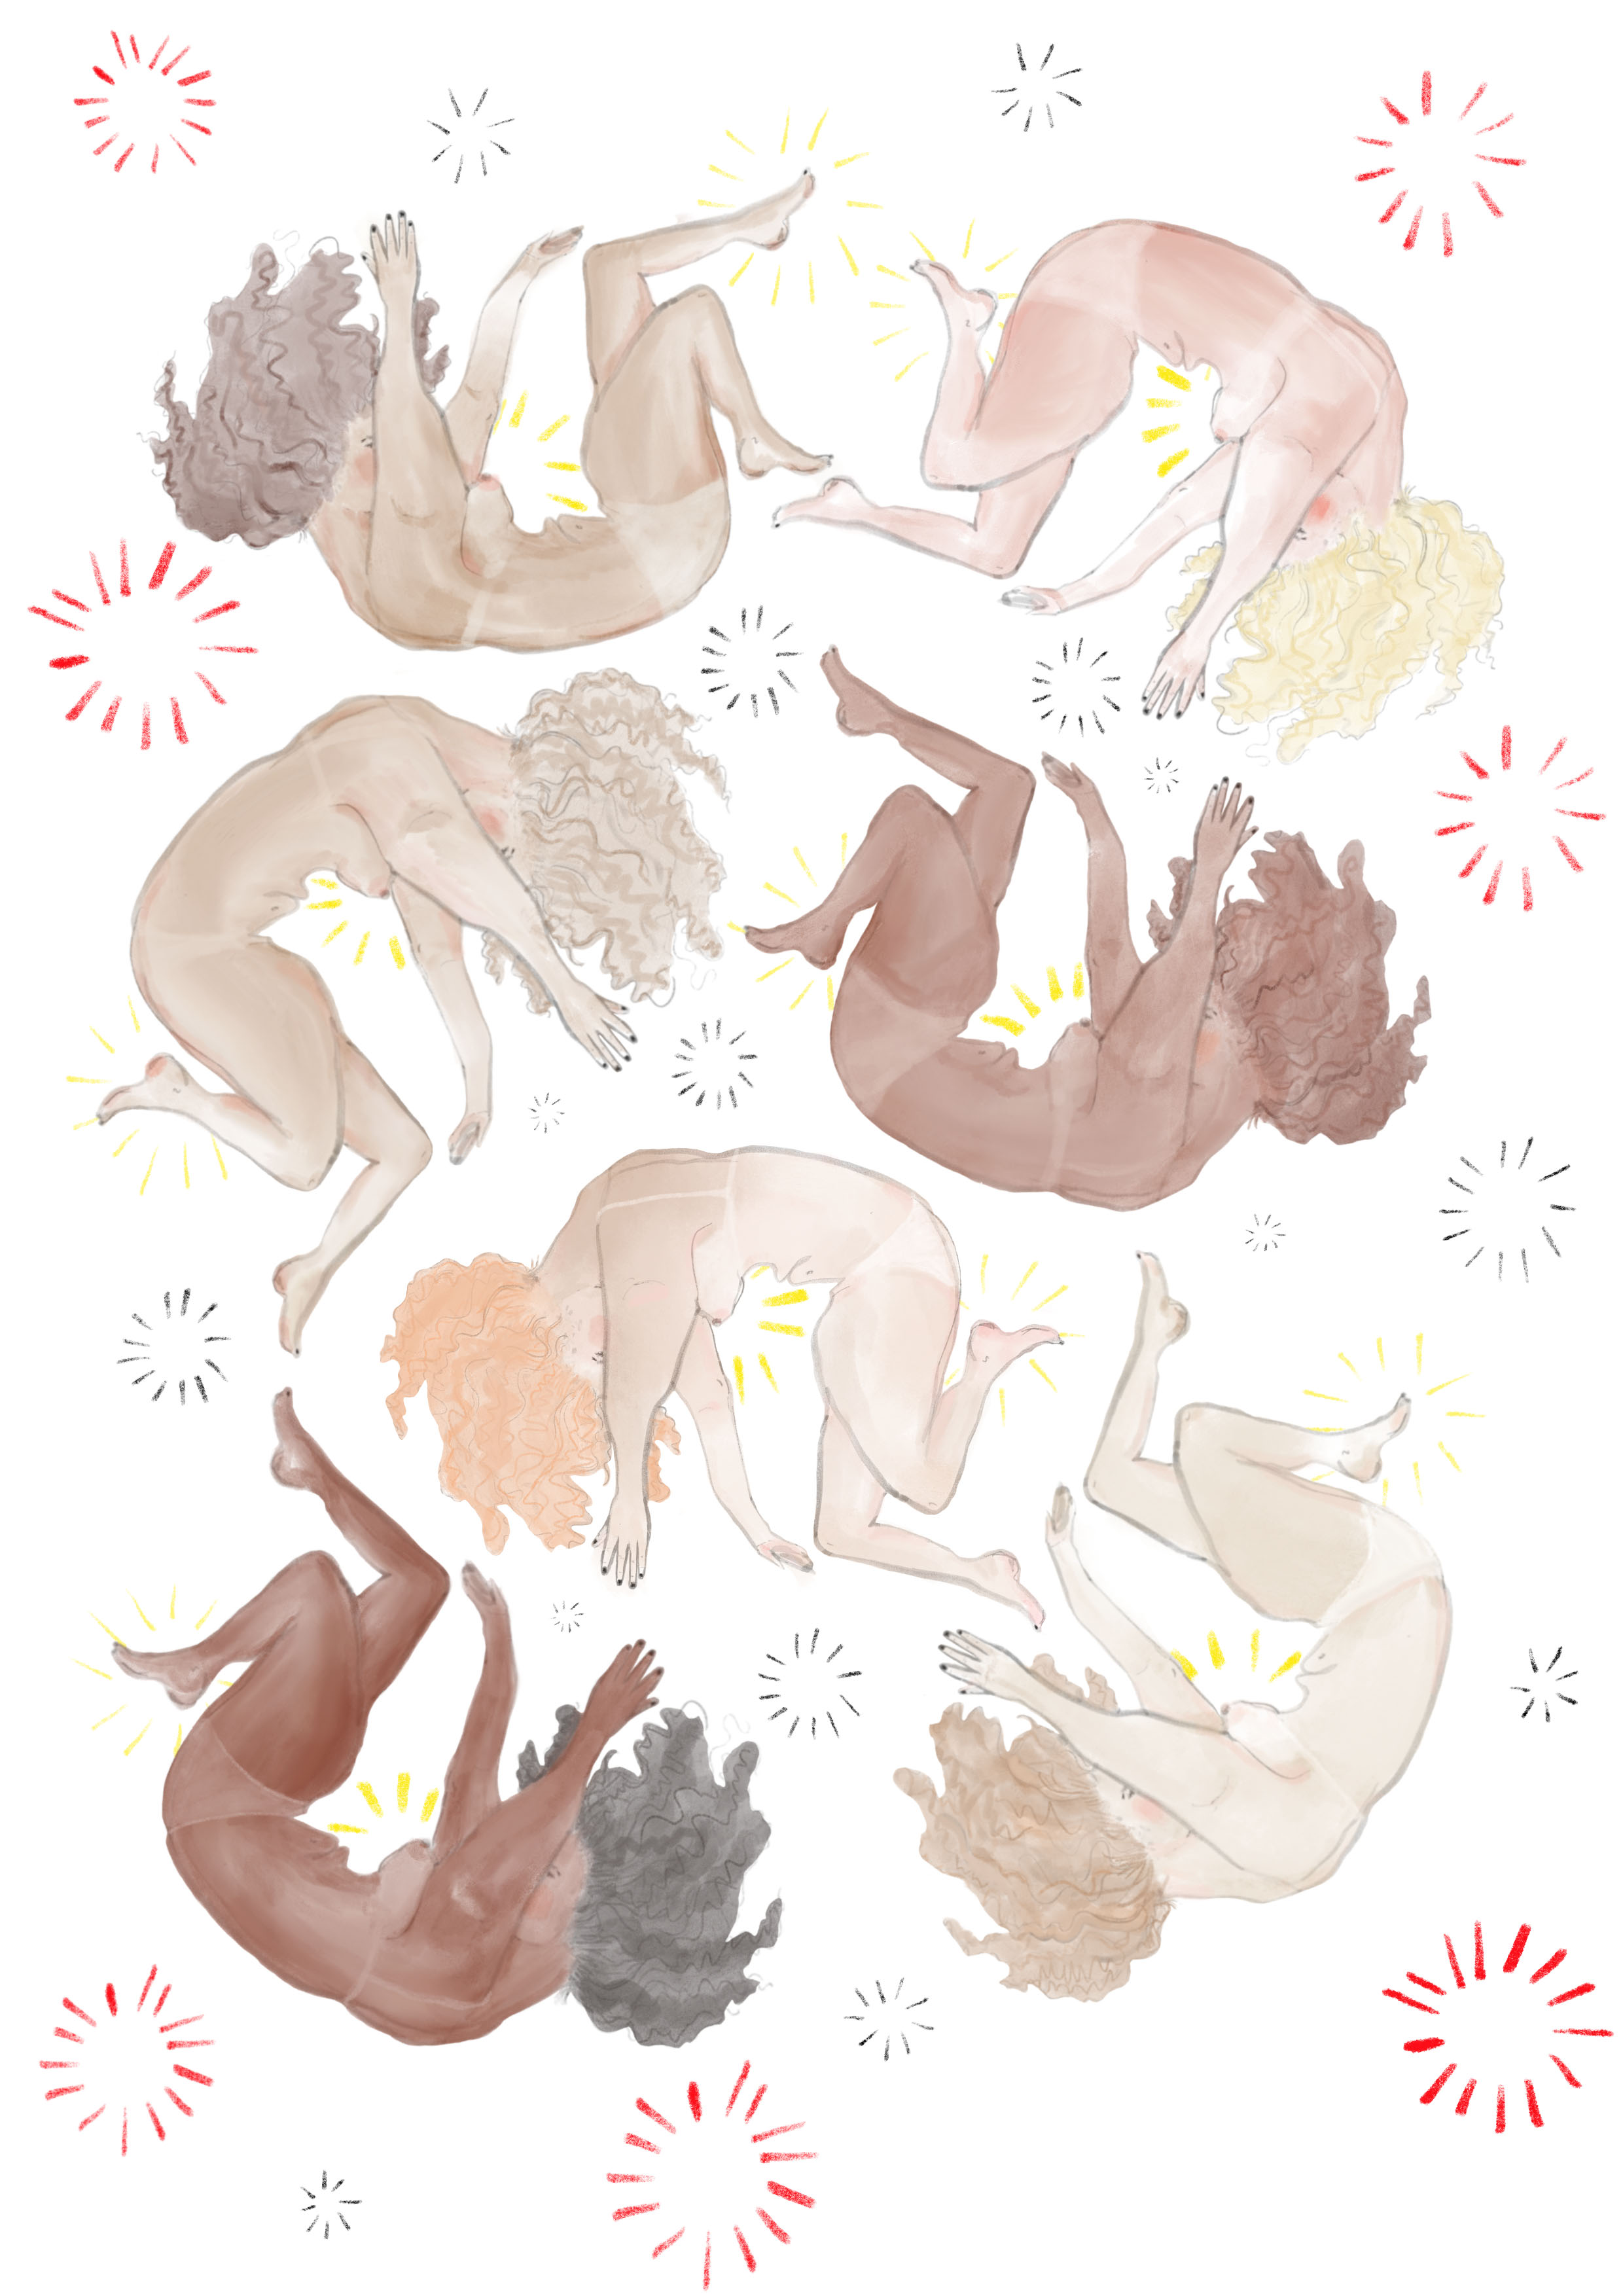 Ladies falling, Chuva Featherstone